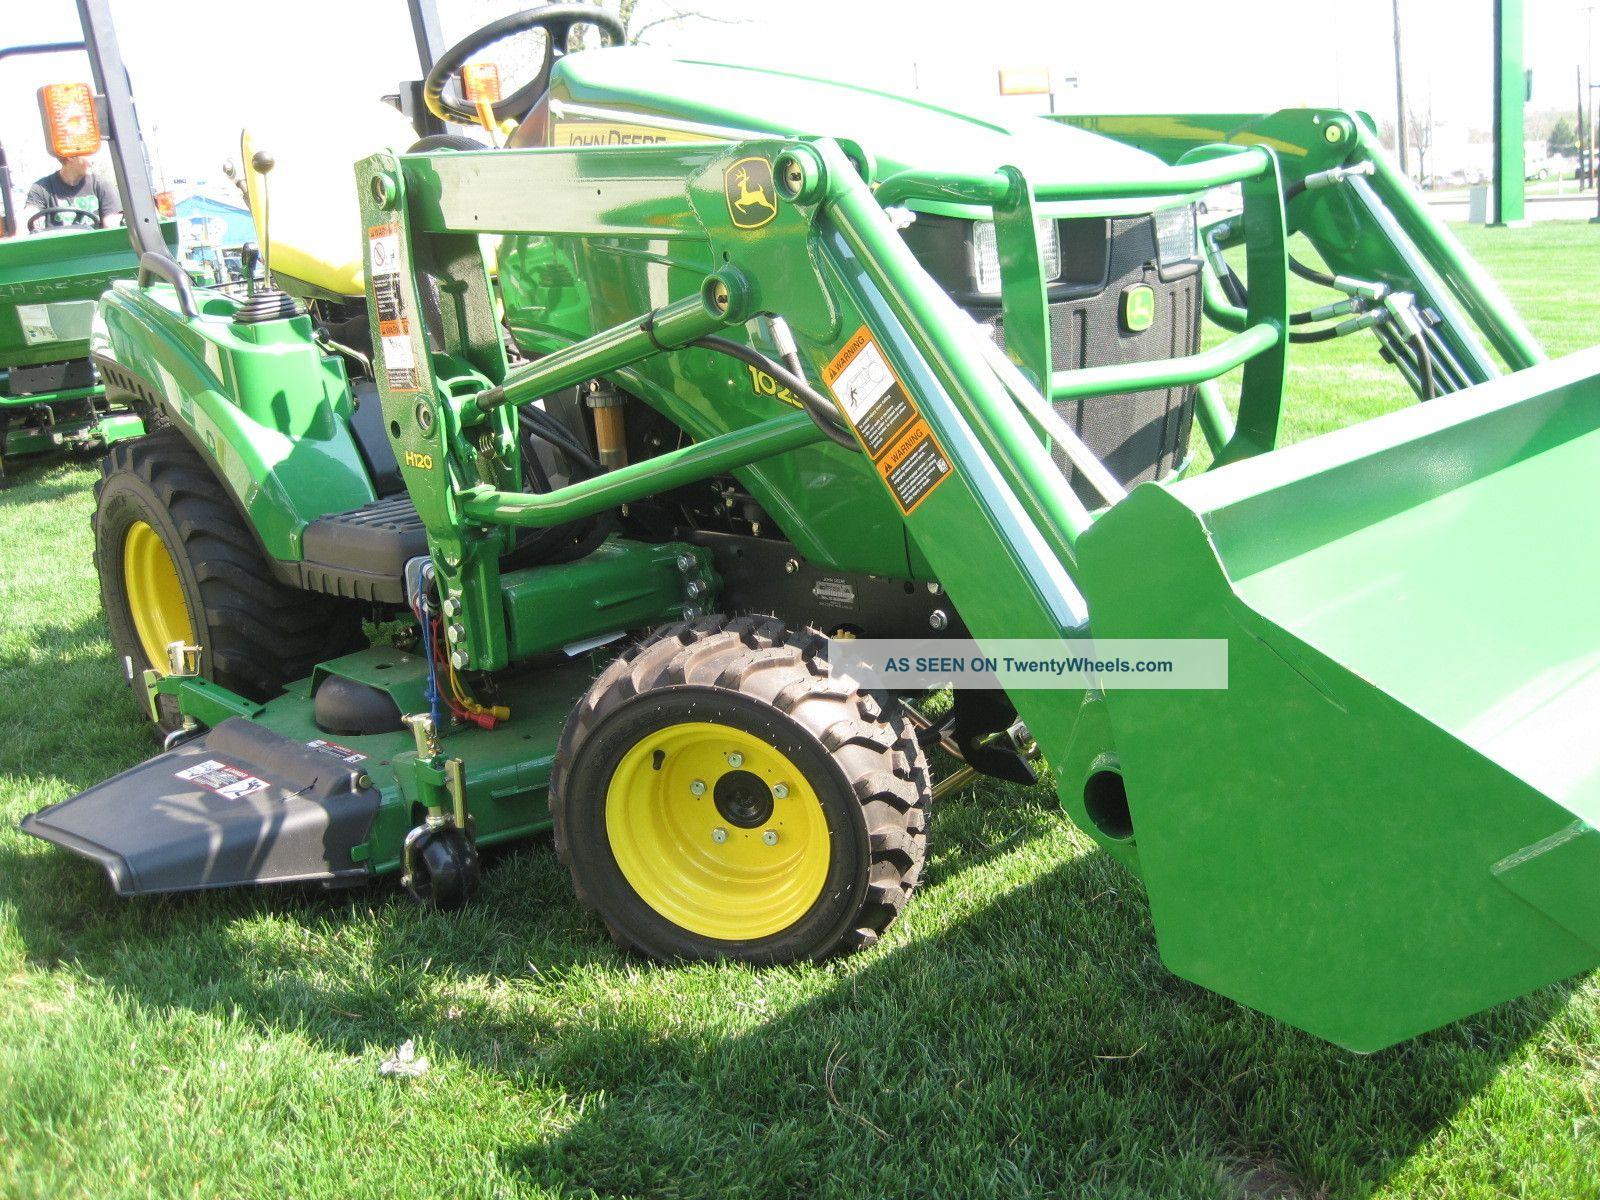 John Deere 1 Series Sub Compact Tractor